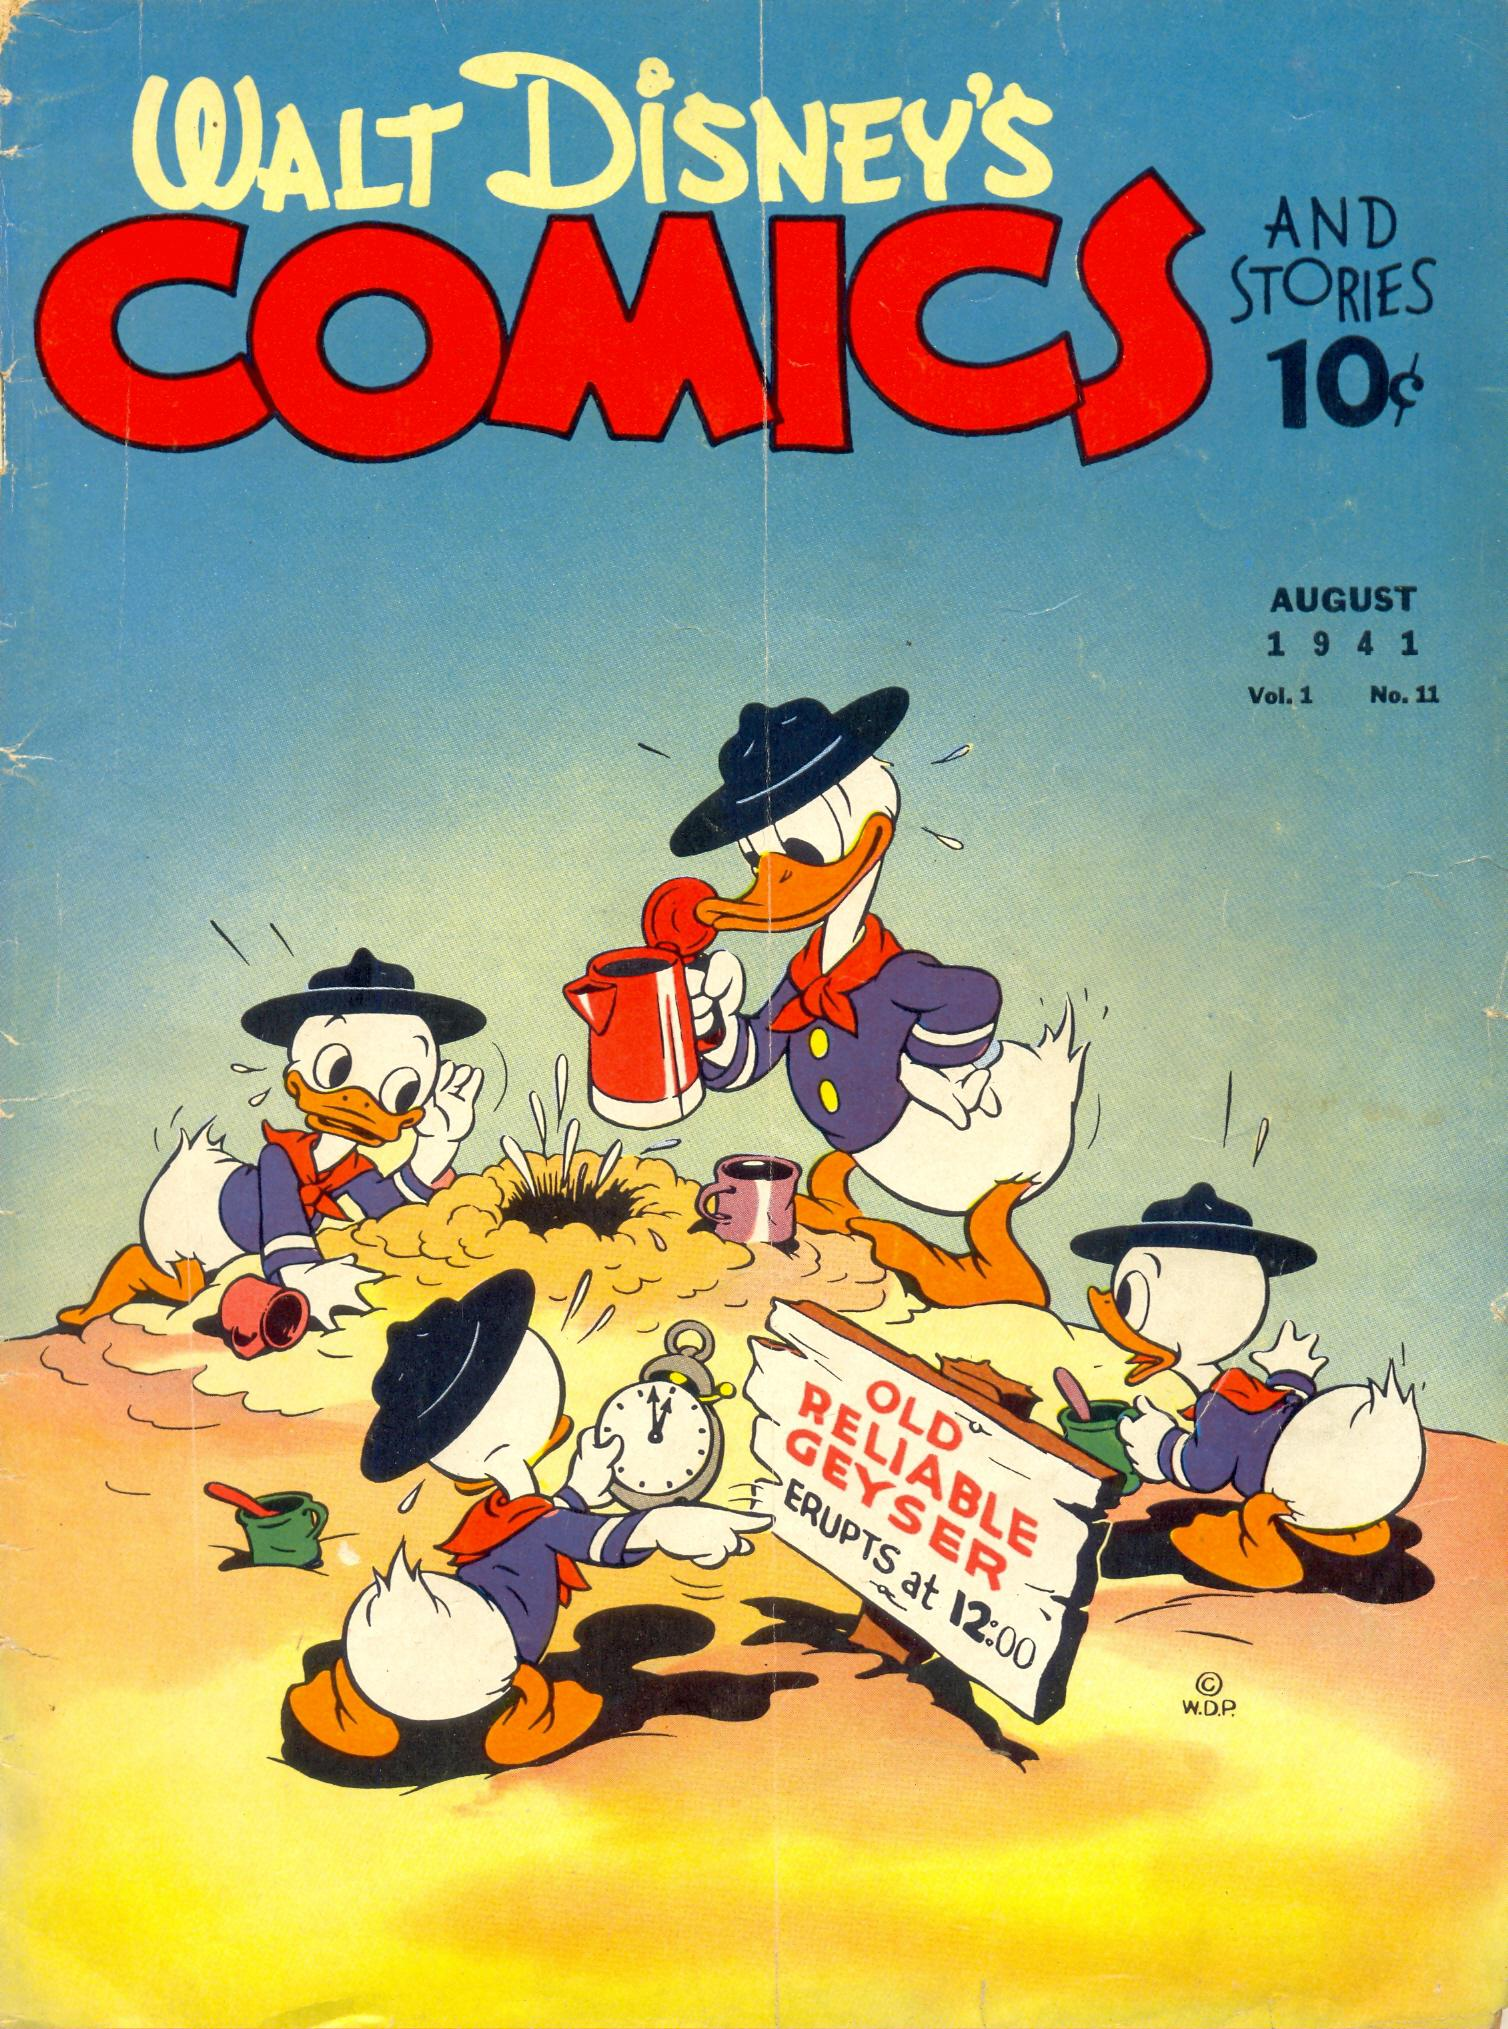 Walt Disneys Comics and Stories 11 Page 1